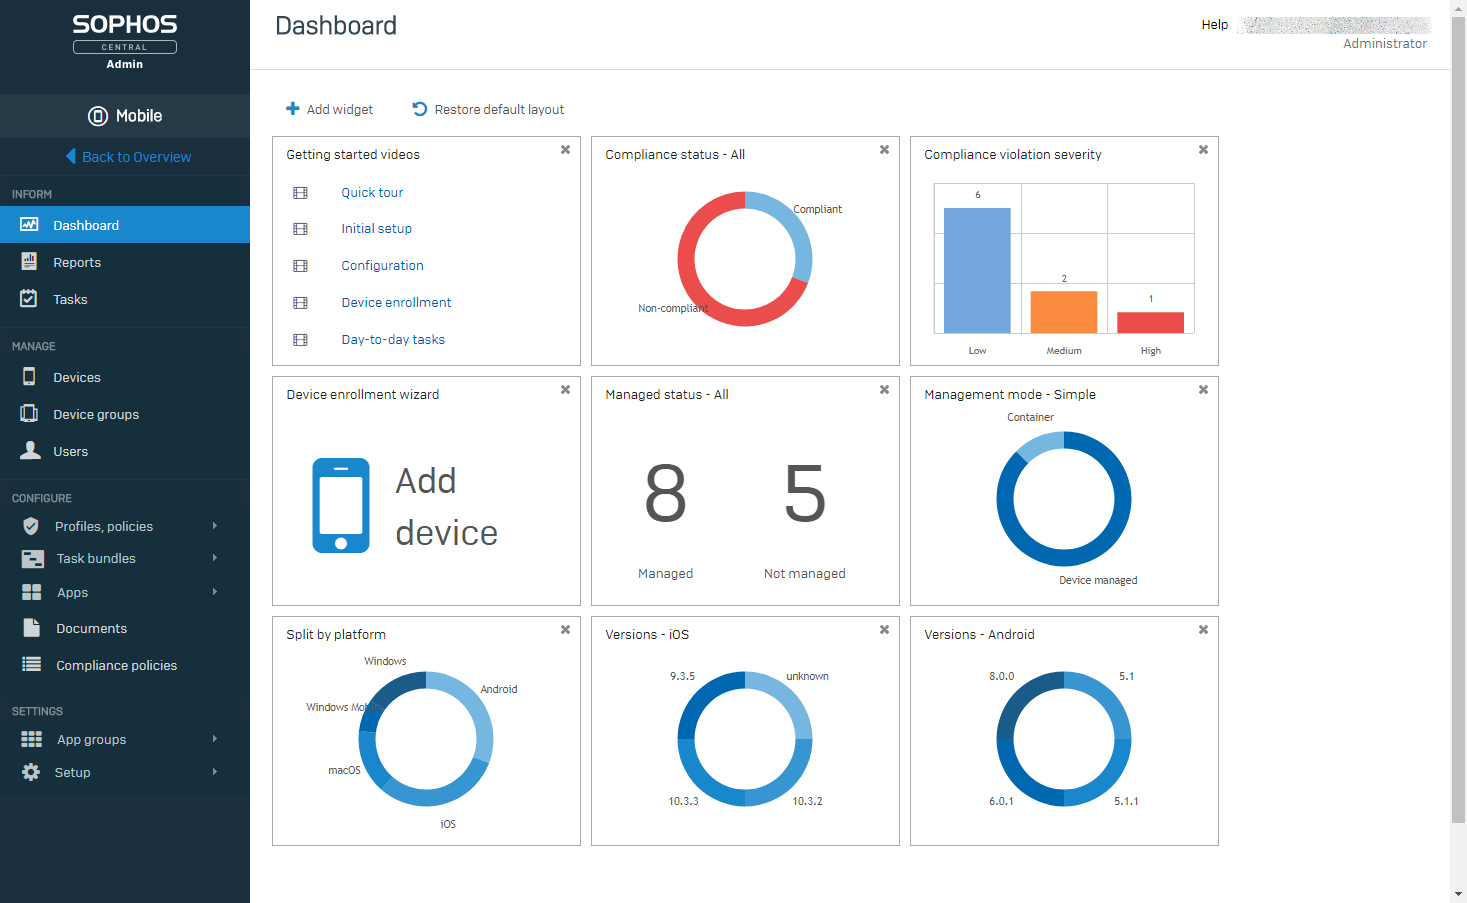 Sophos mobile admin dashboard